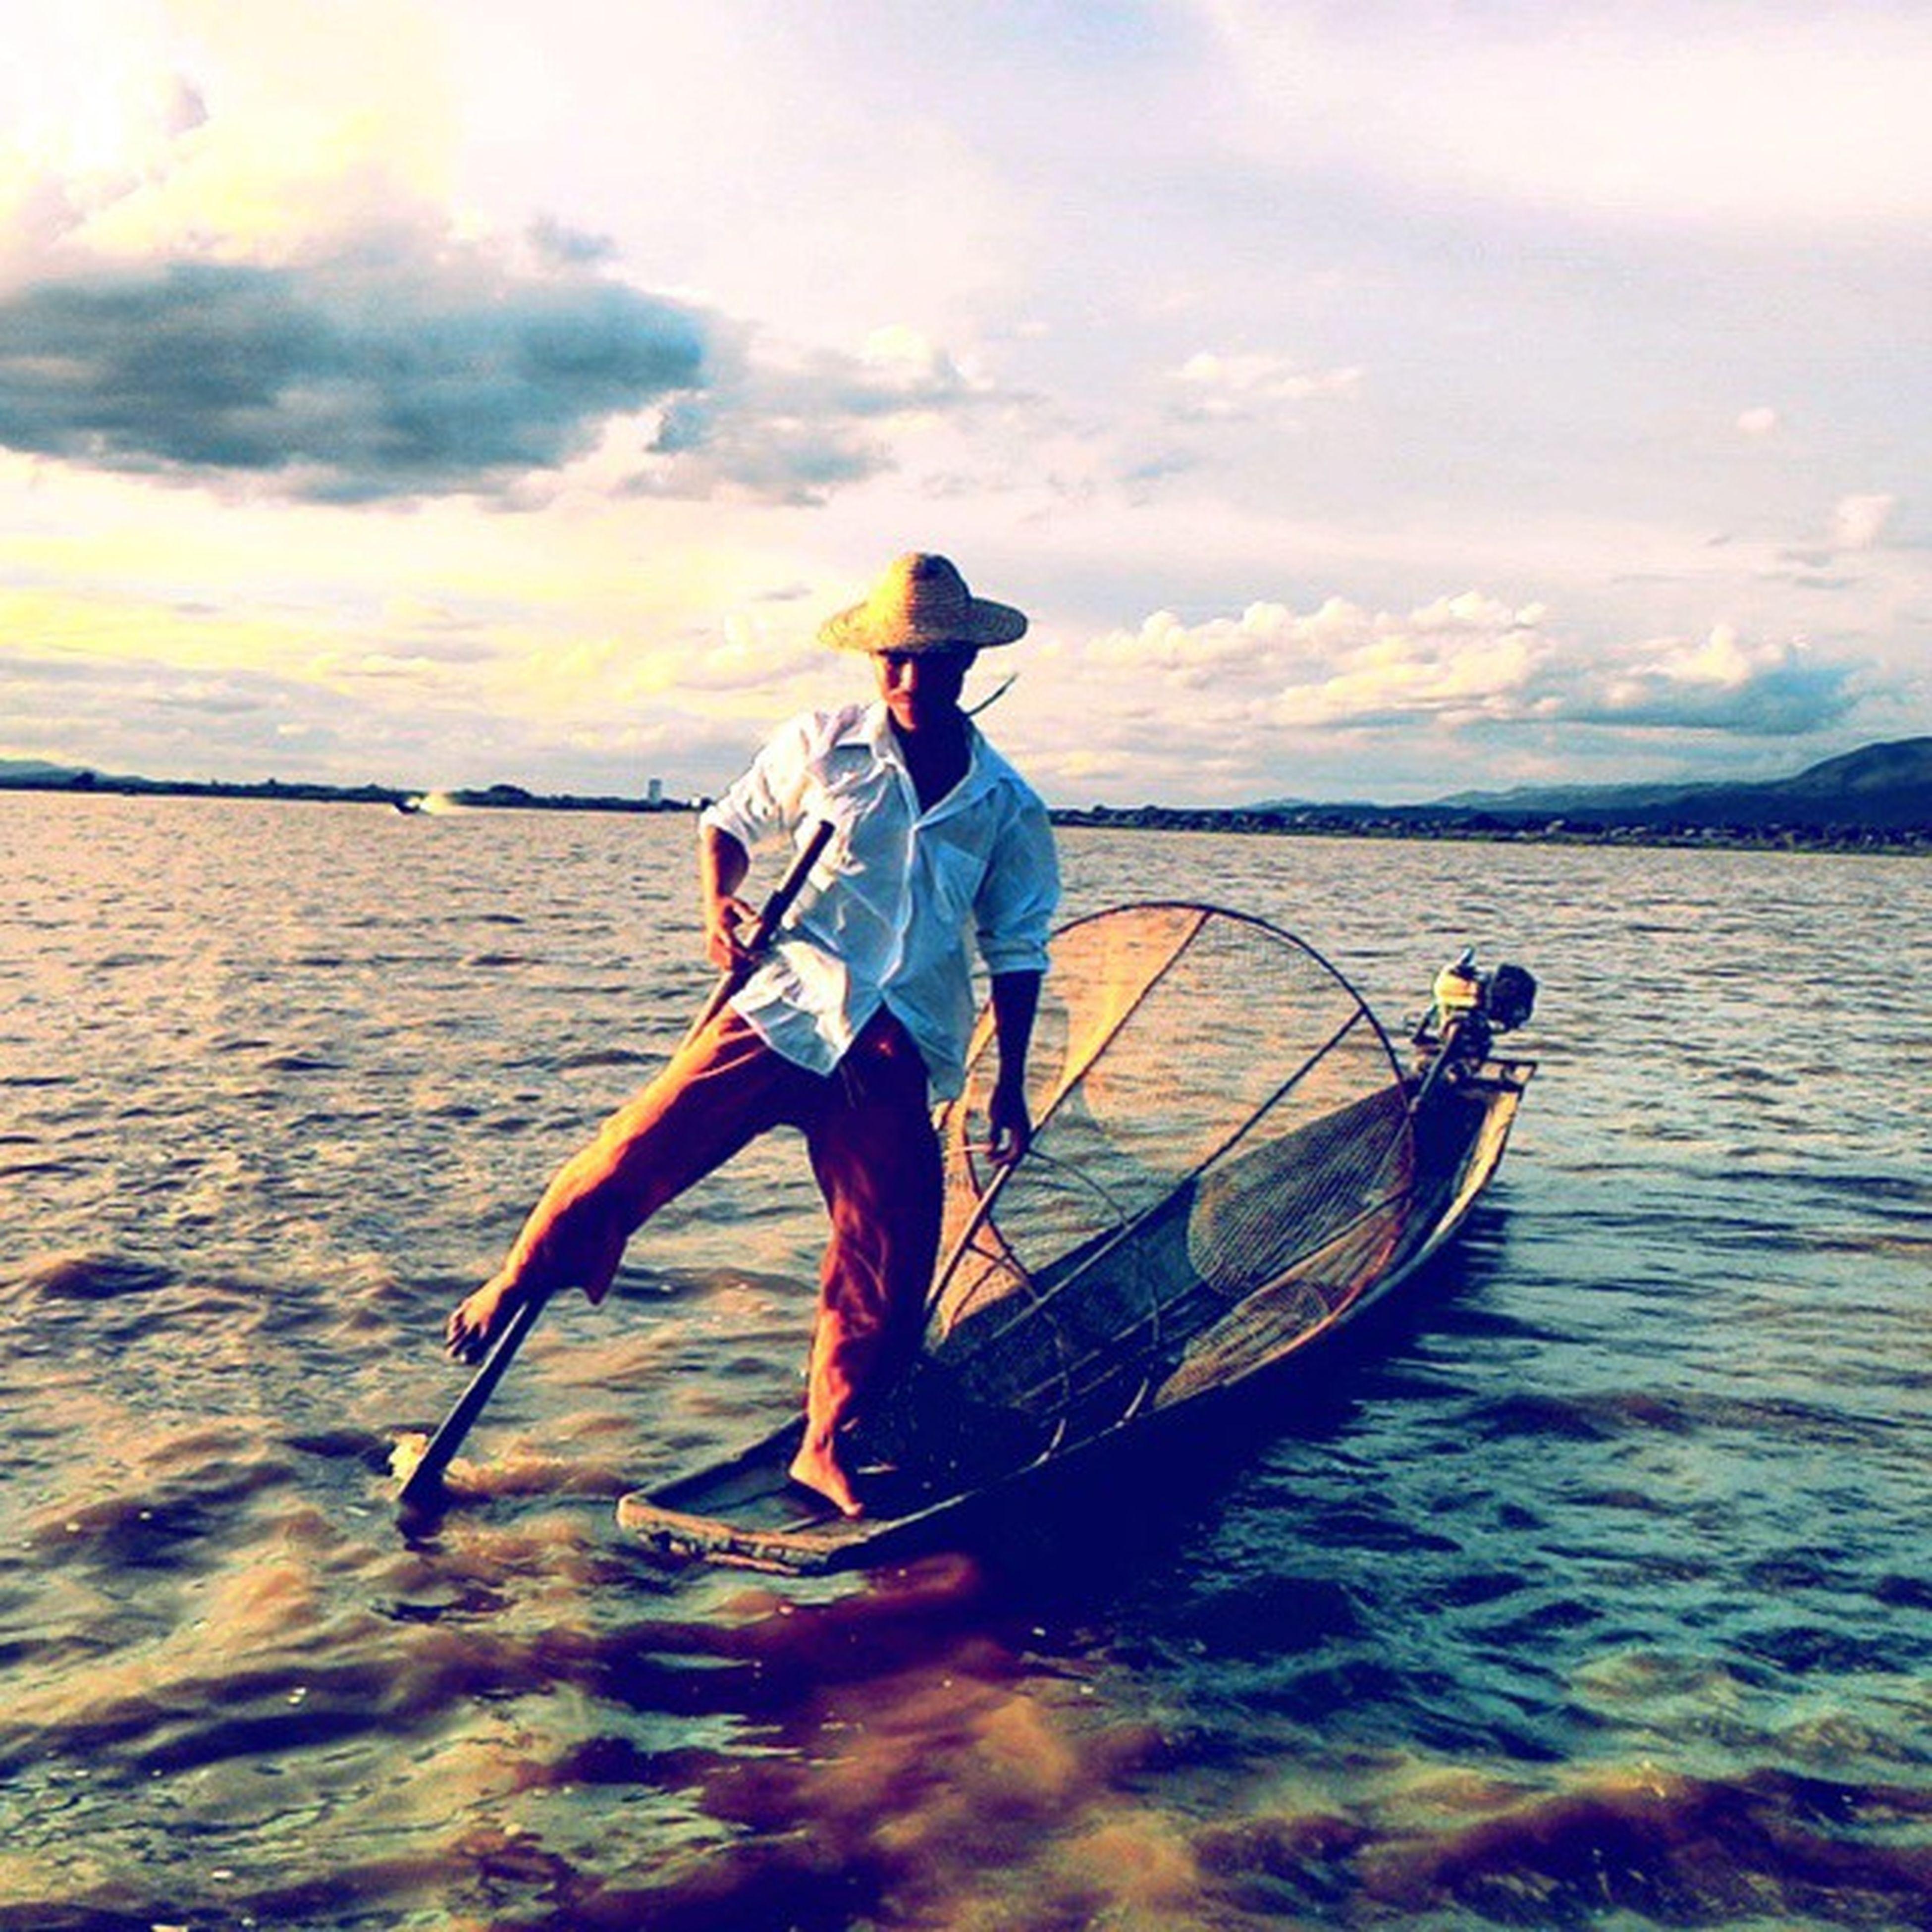 Inthar fisherman in Inle Lake, Myanmar. Intharthribe Inlelake Intharfisherman Inle Myanmar Lake Fisherman Clouds Sunsets